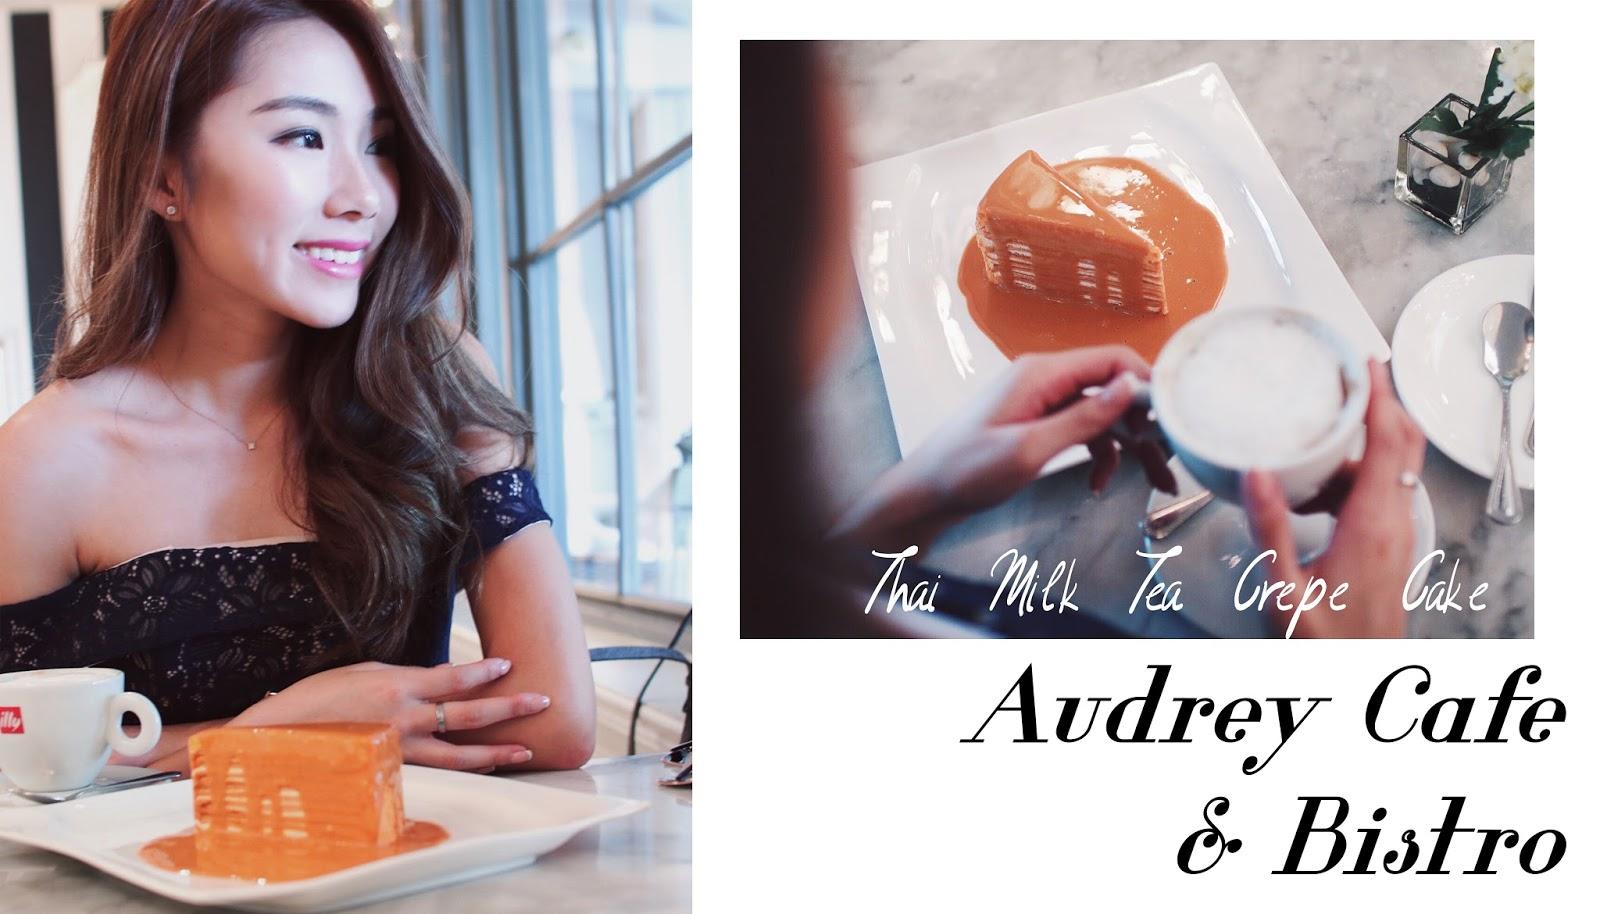 Audrey, bkk, crepe cake, coffee